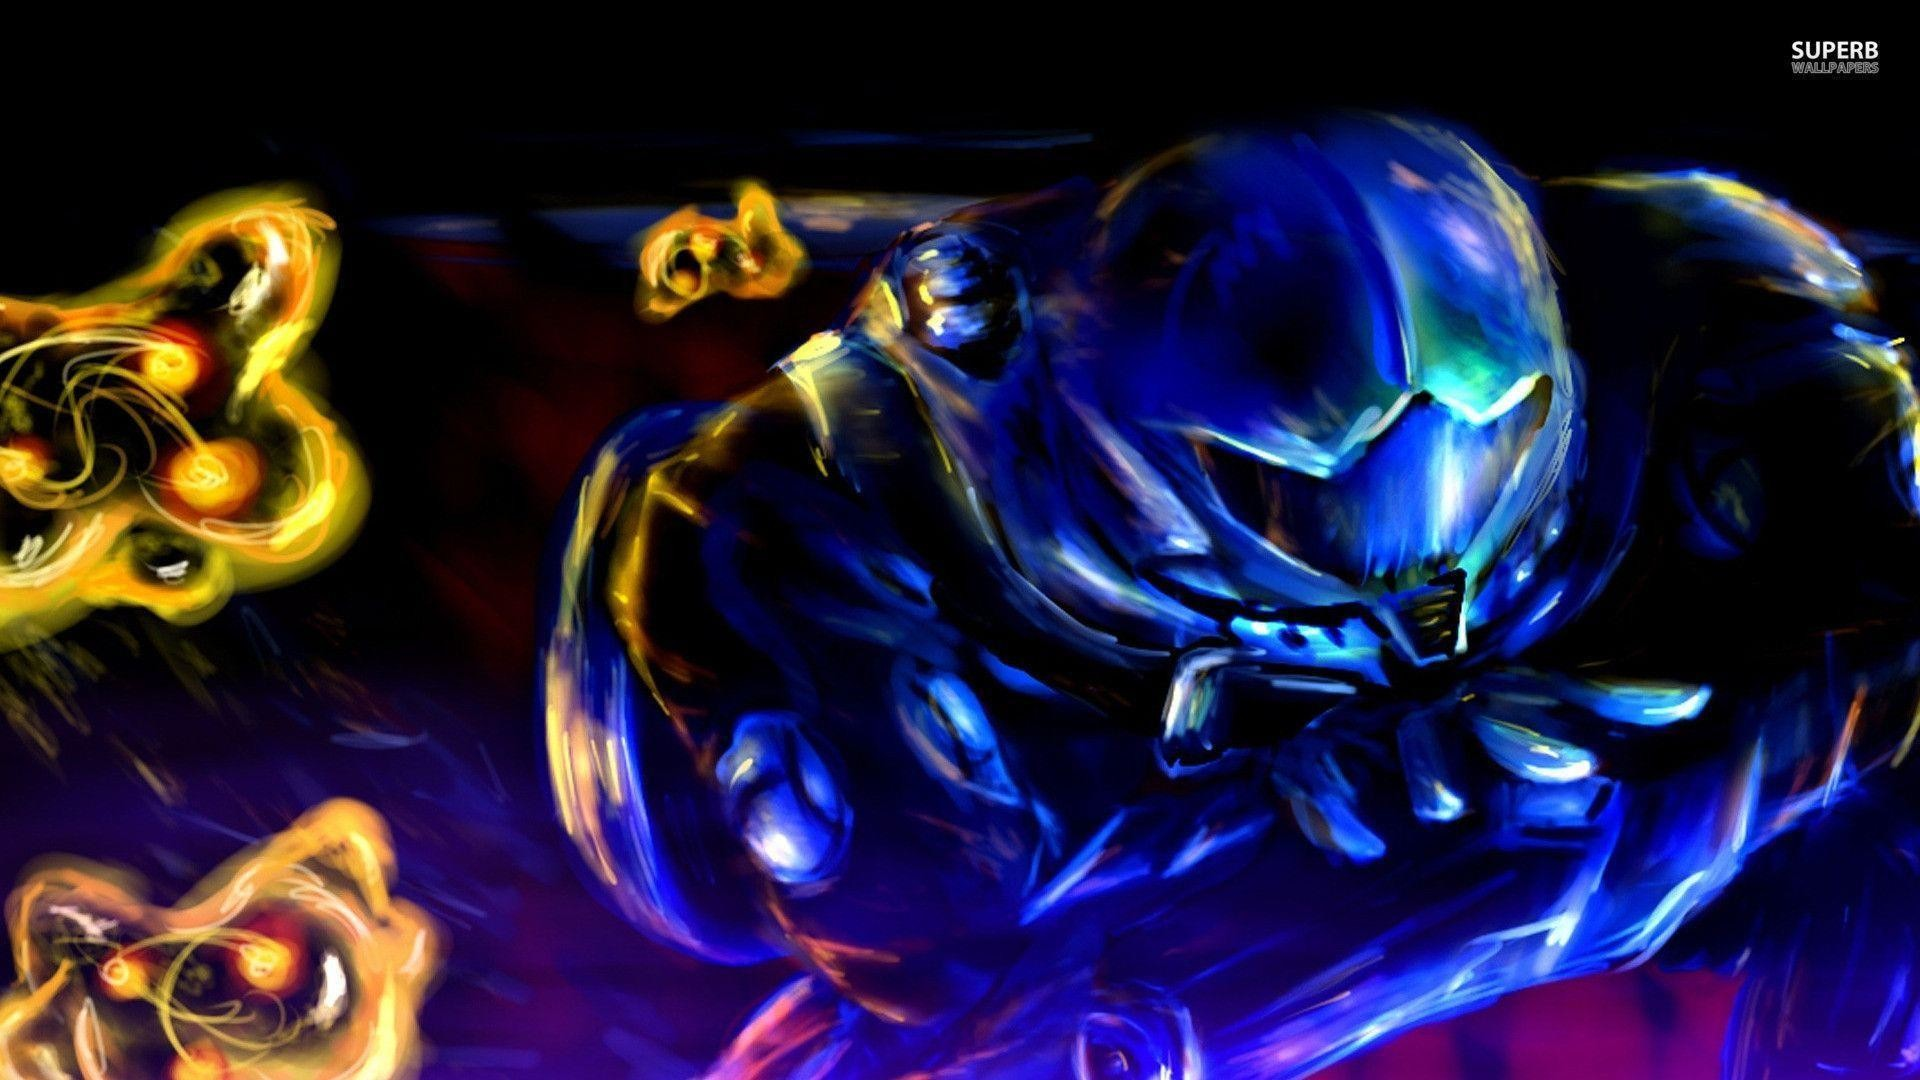 Metroid Fusion wallpaper – Game wallpapers – #